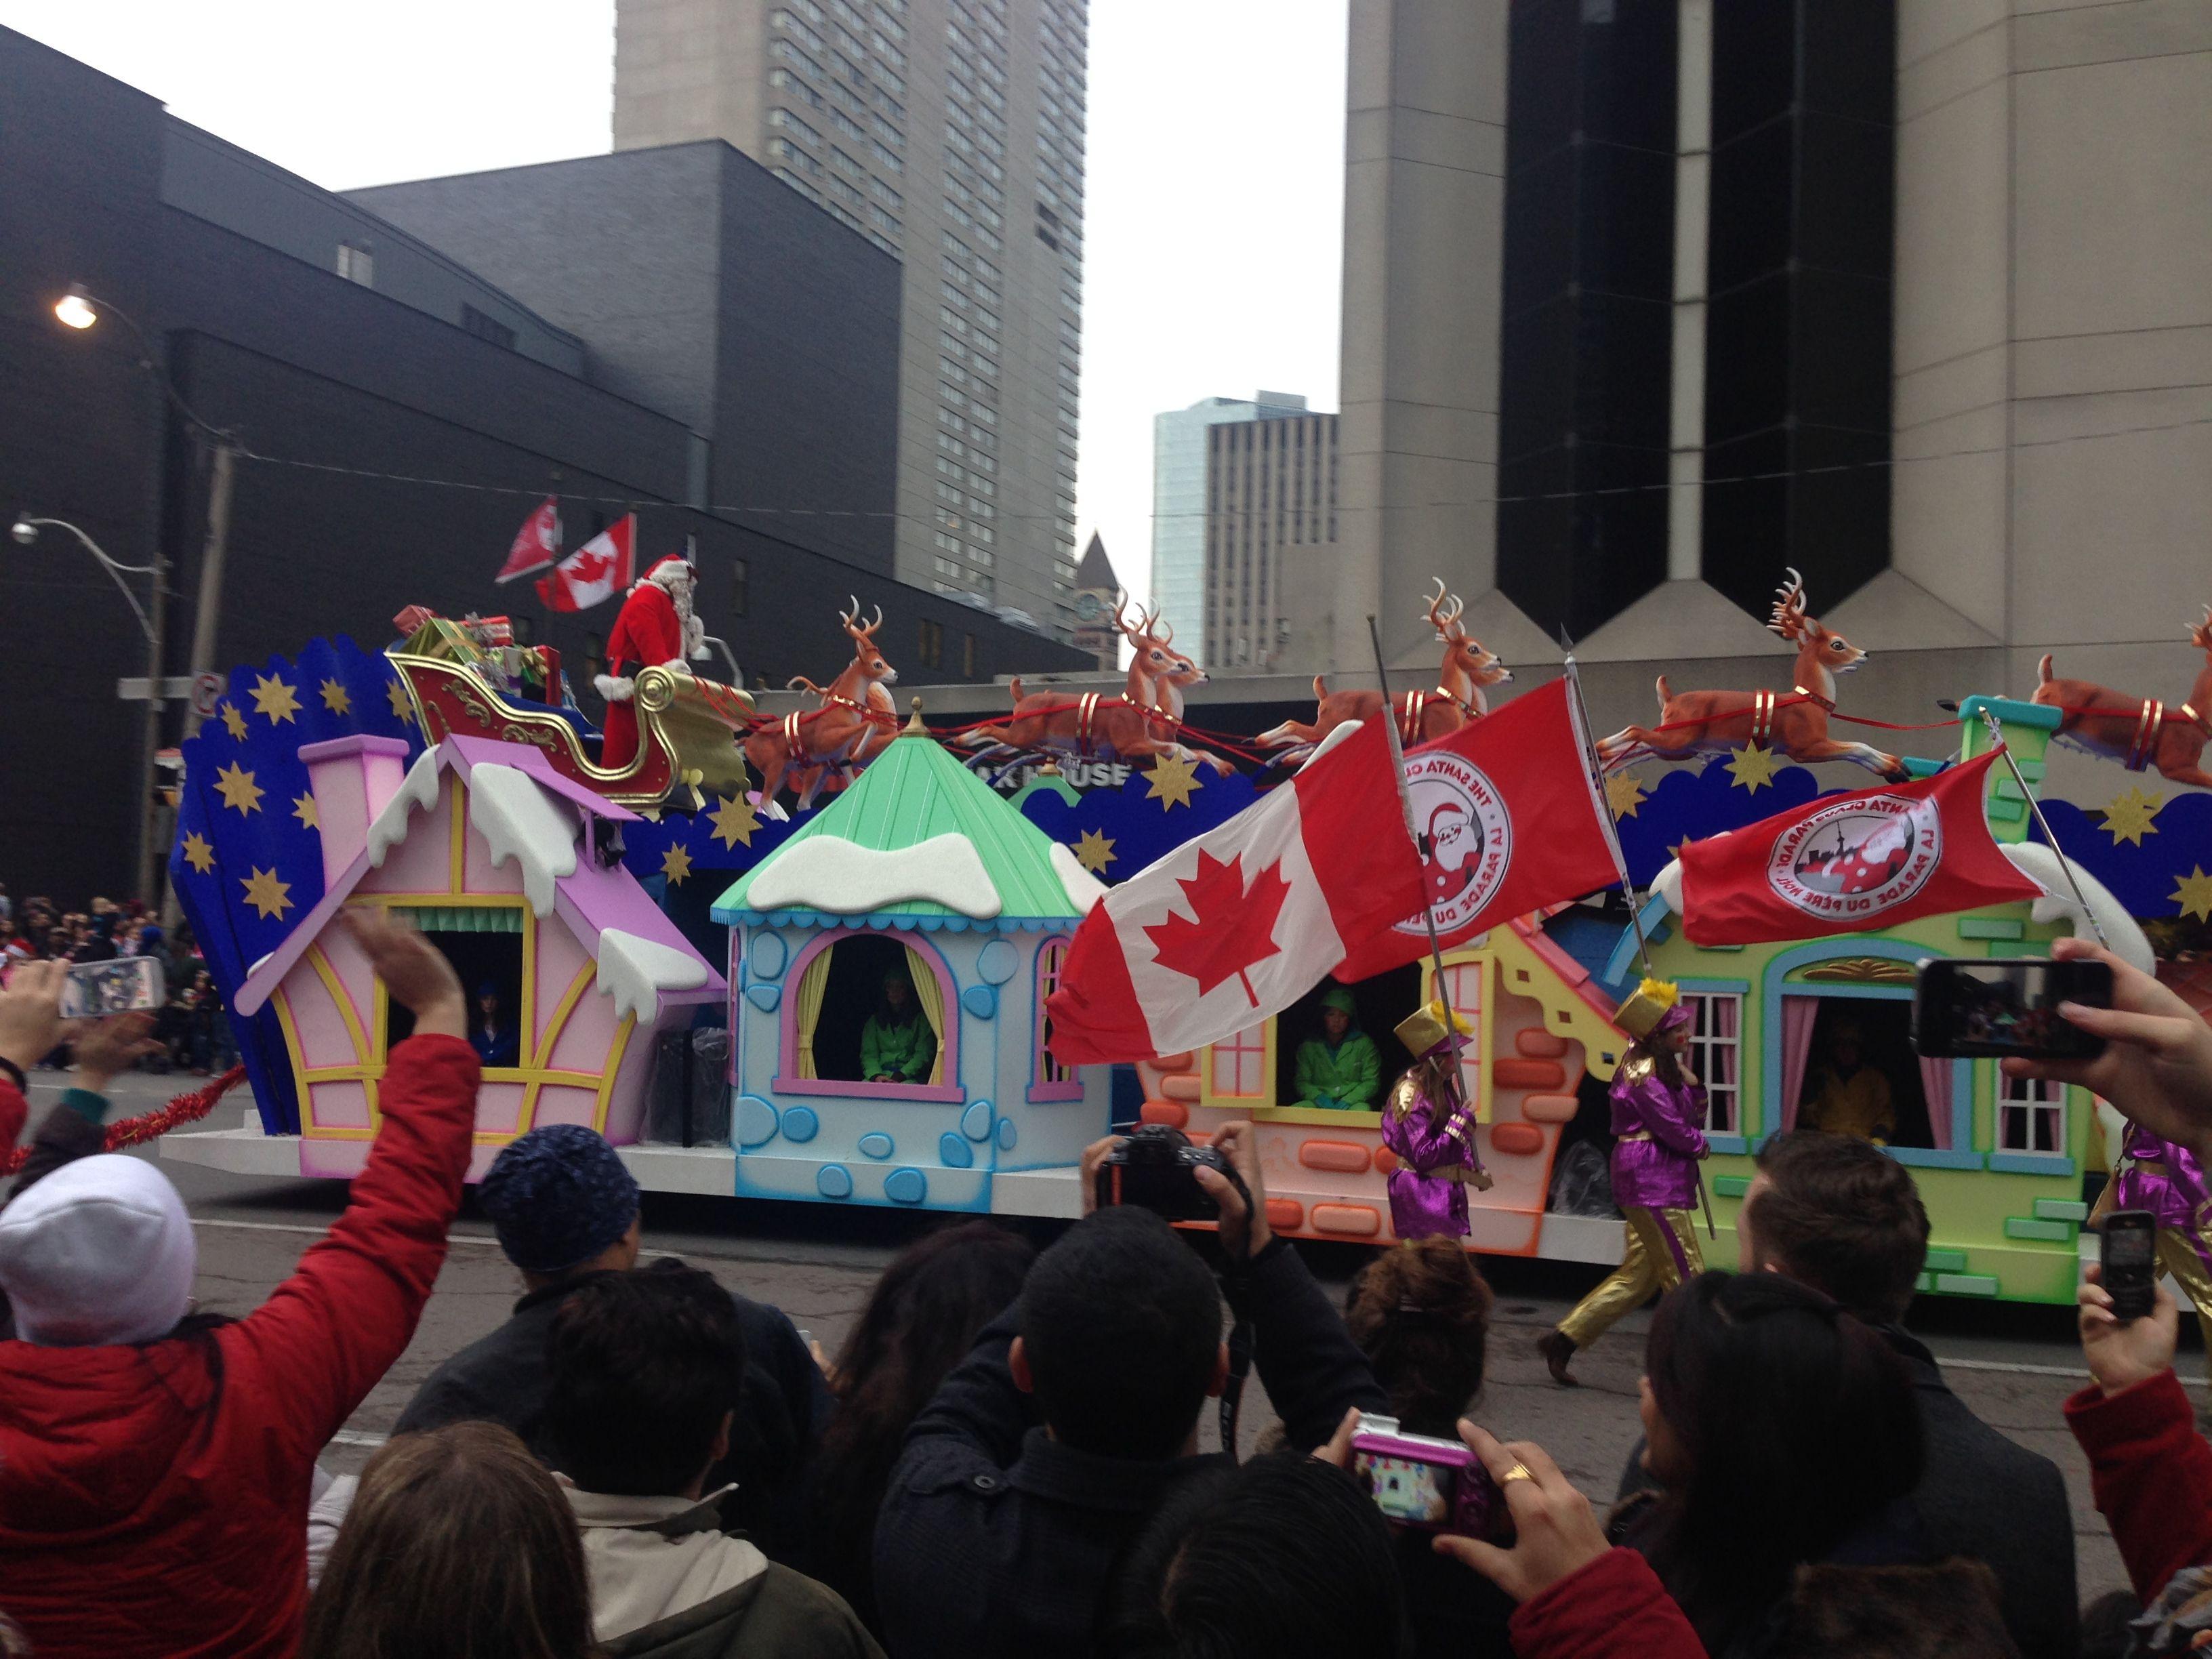 Santa Claus Parade, Toronto, Canada. Santa claus parade